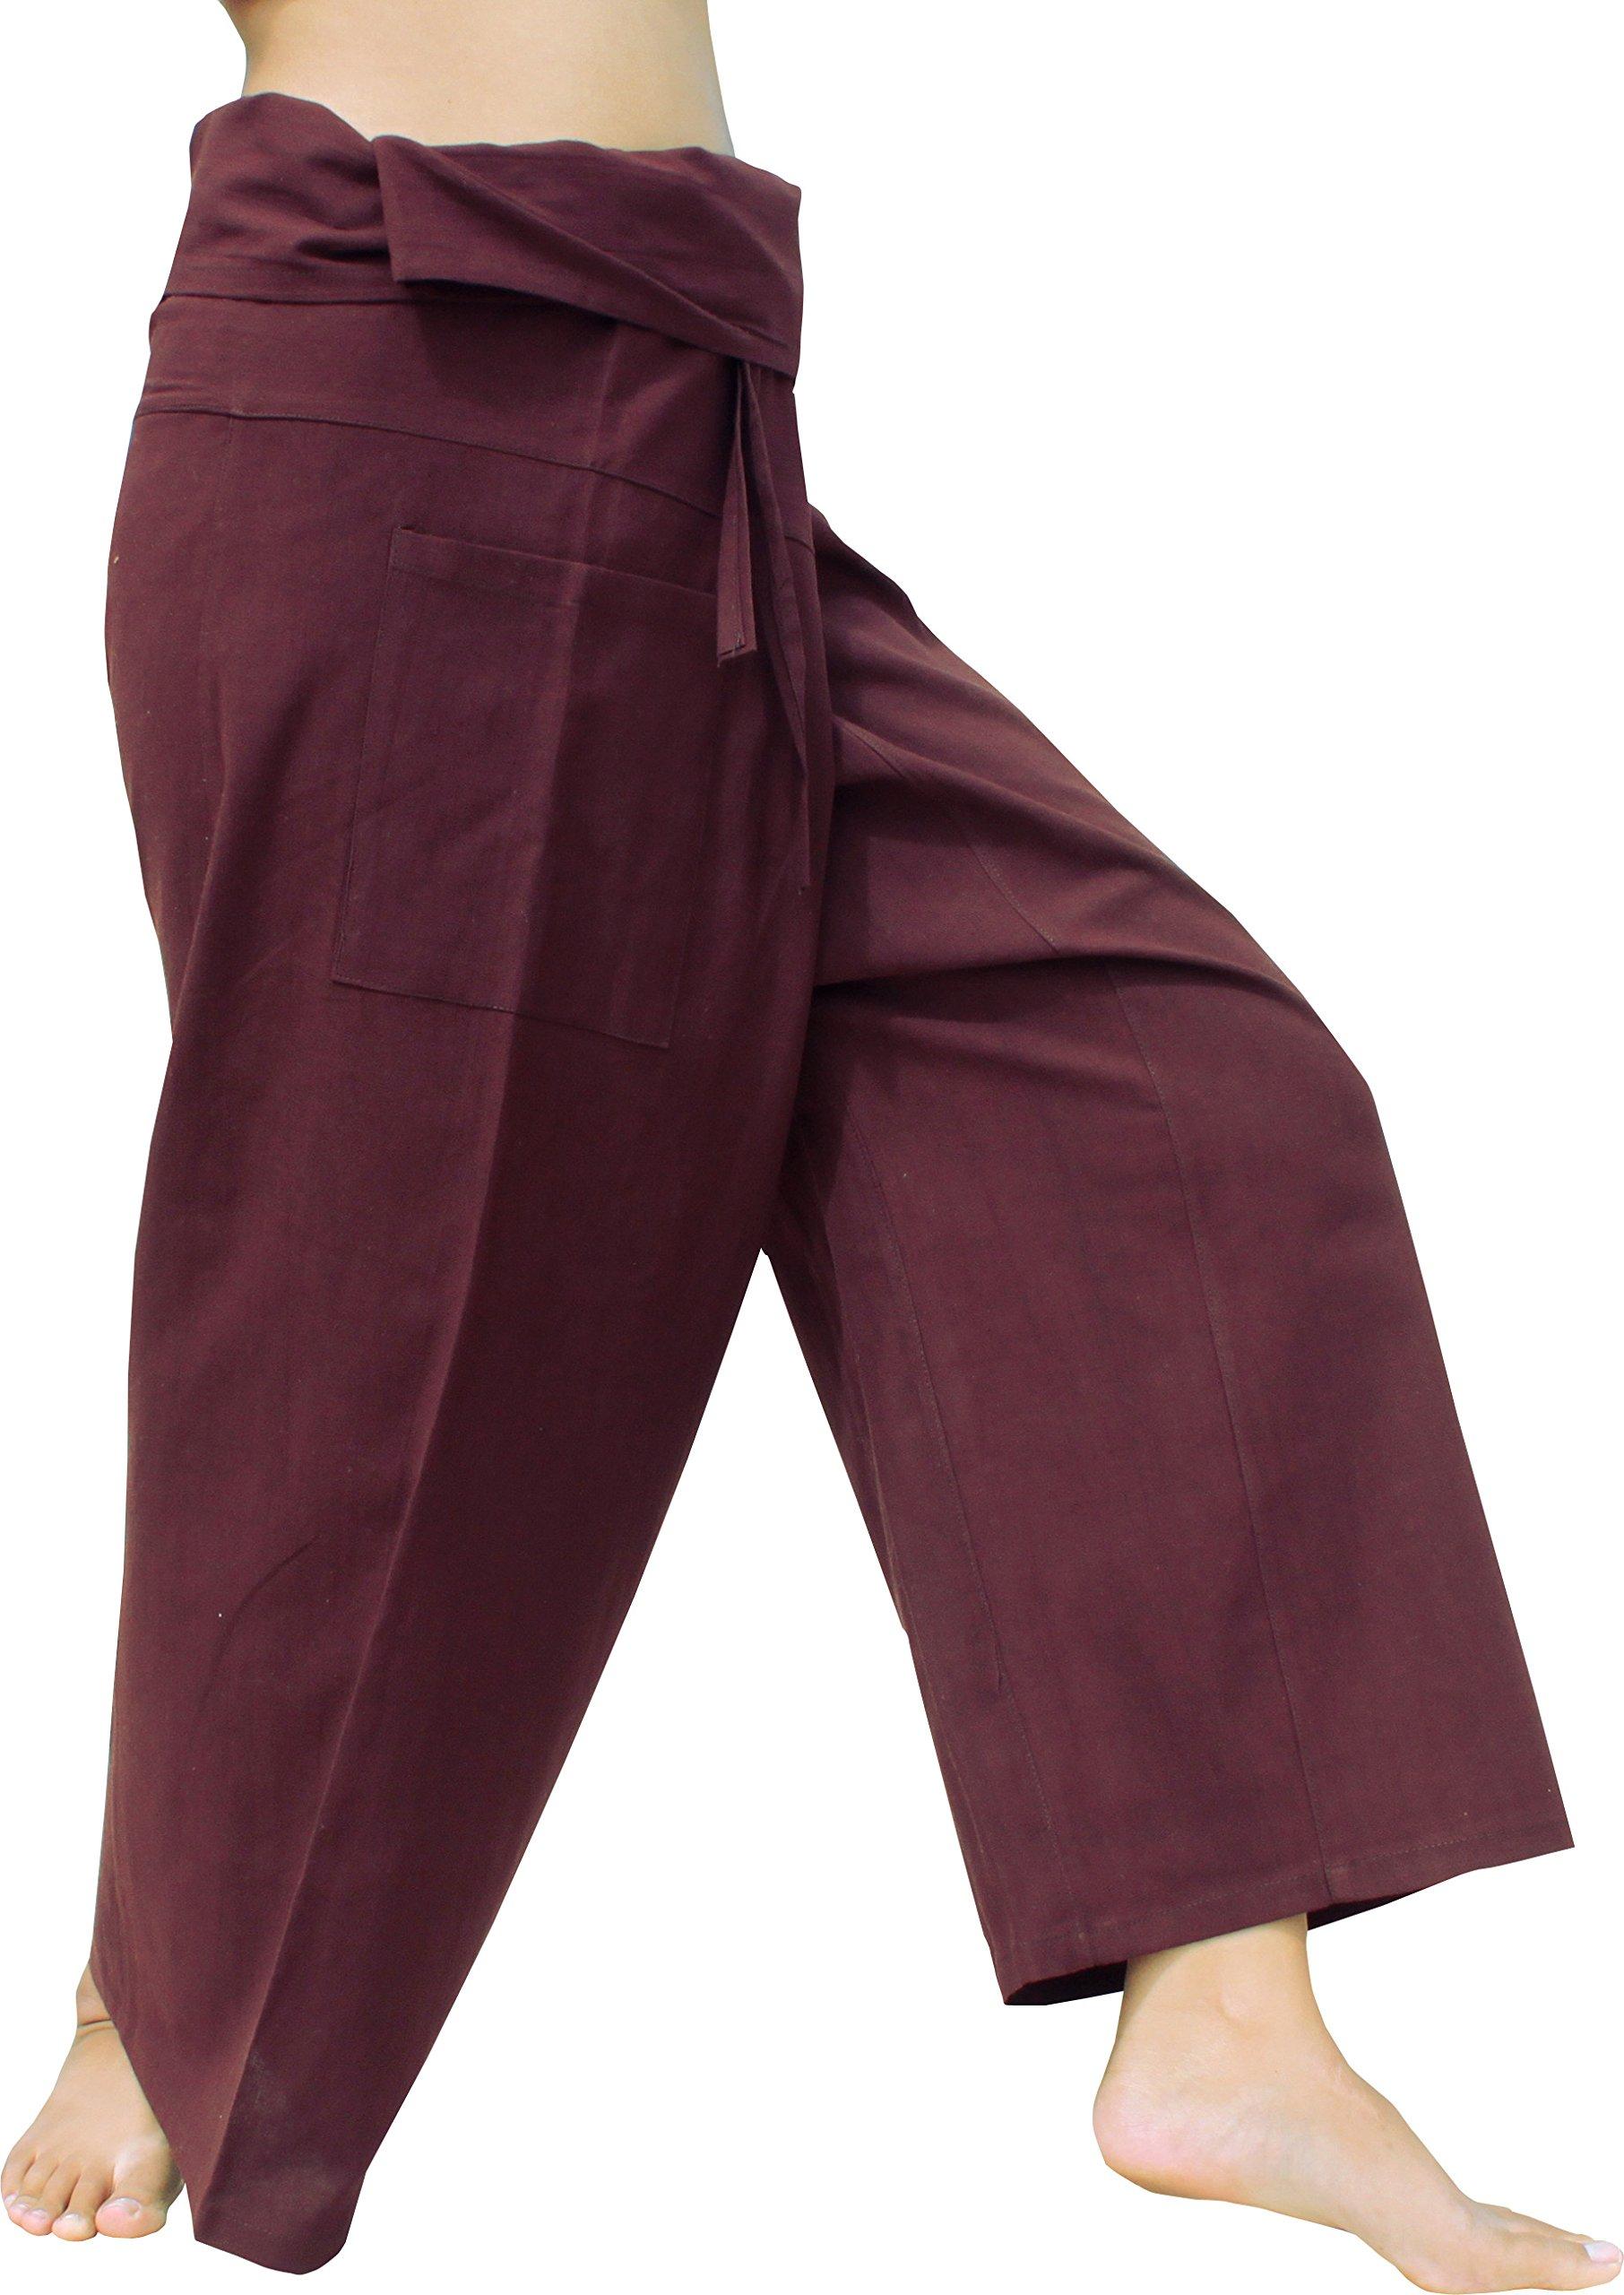 Raan Pah Muang Brand Light Summer Cotton Thai Plain Fisherman Wrap Pants Tall Cut, Small, Dark Brown by Raan Pah Muang